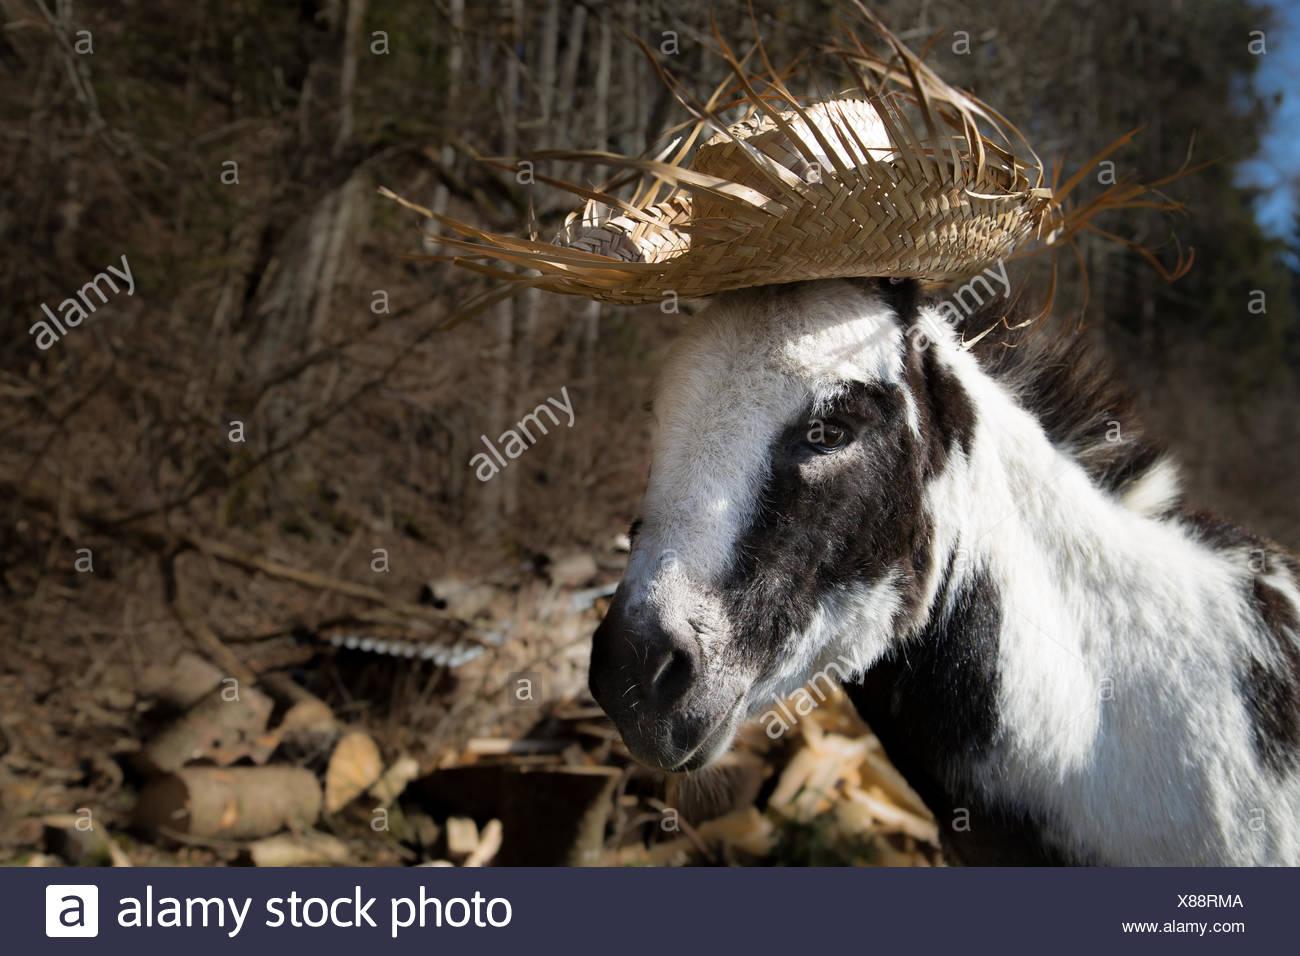 Donkey with Summer Hat - Stock Image